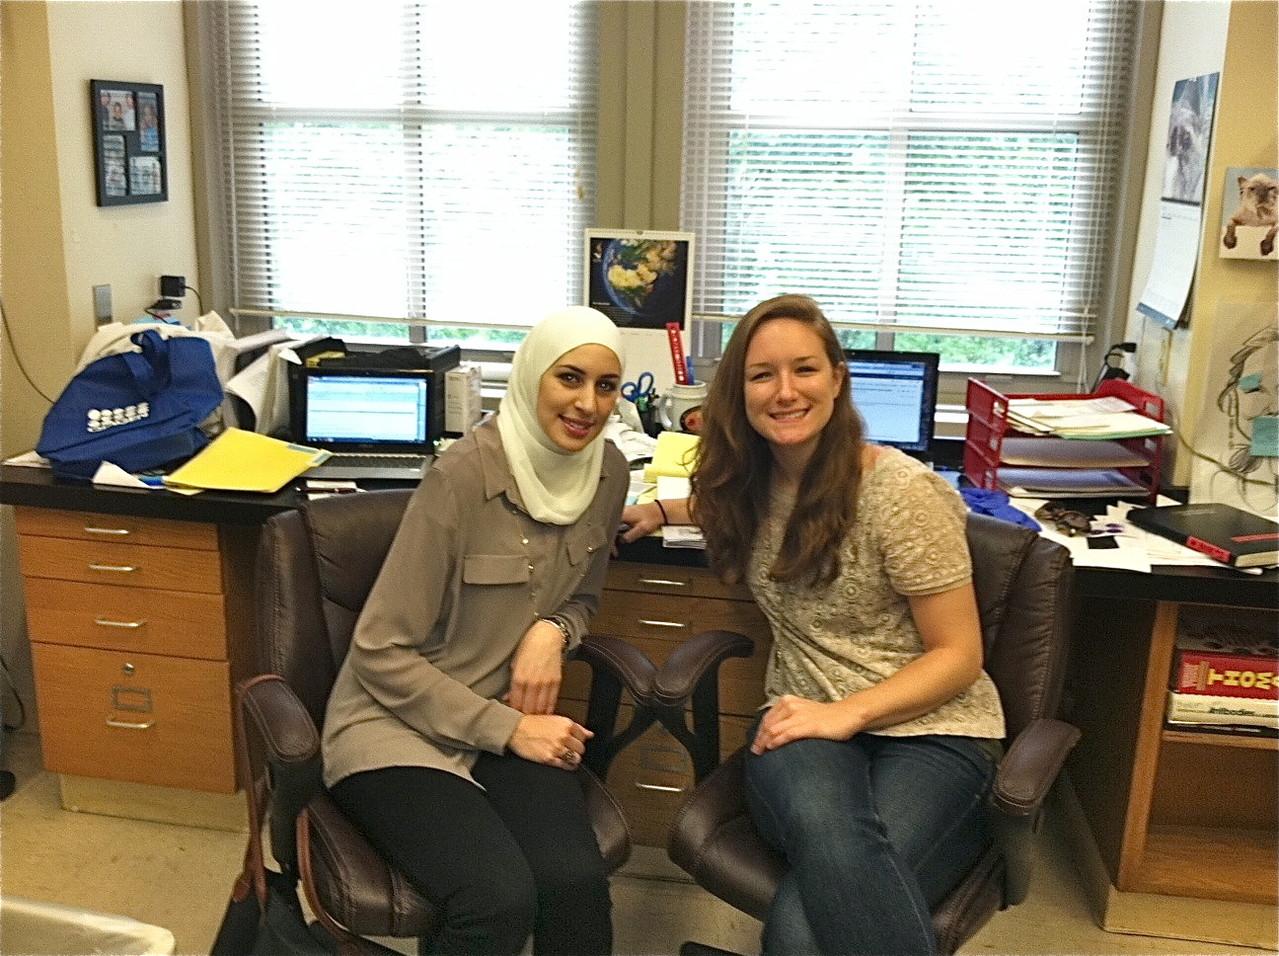 Weill Cornell-Qatar medical student Noor Nema & Abby Horstmann work on a summer project together, July 1, 2013